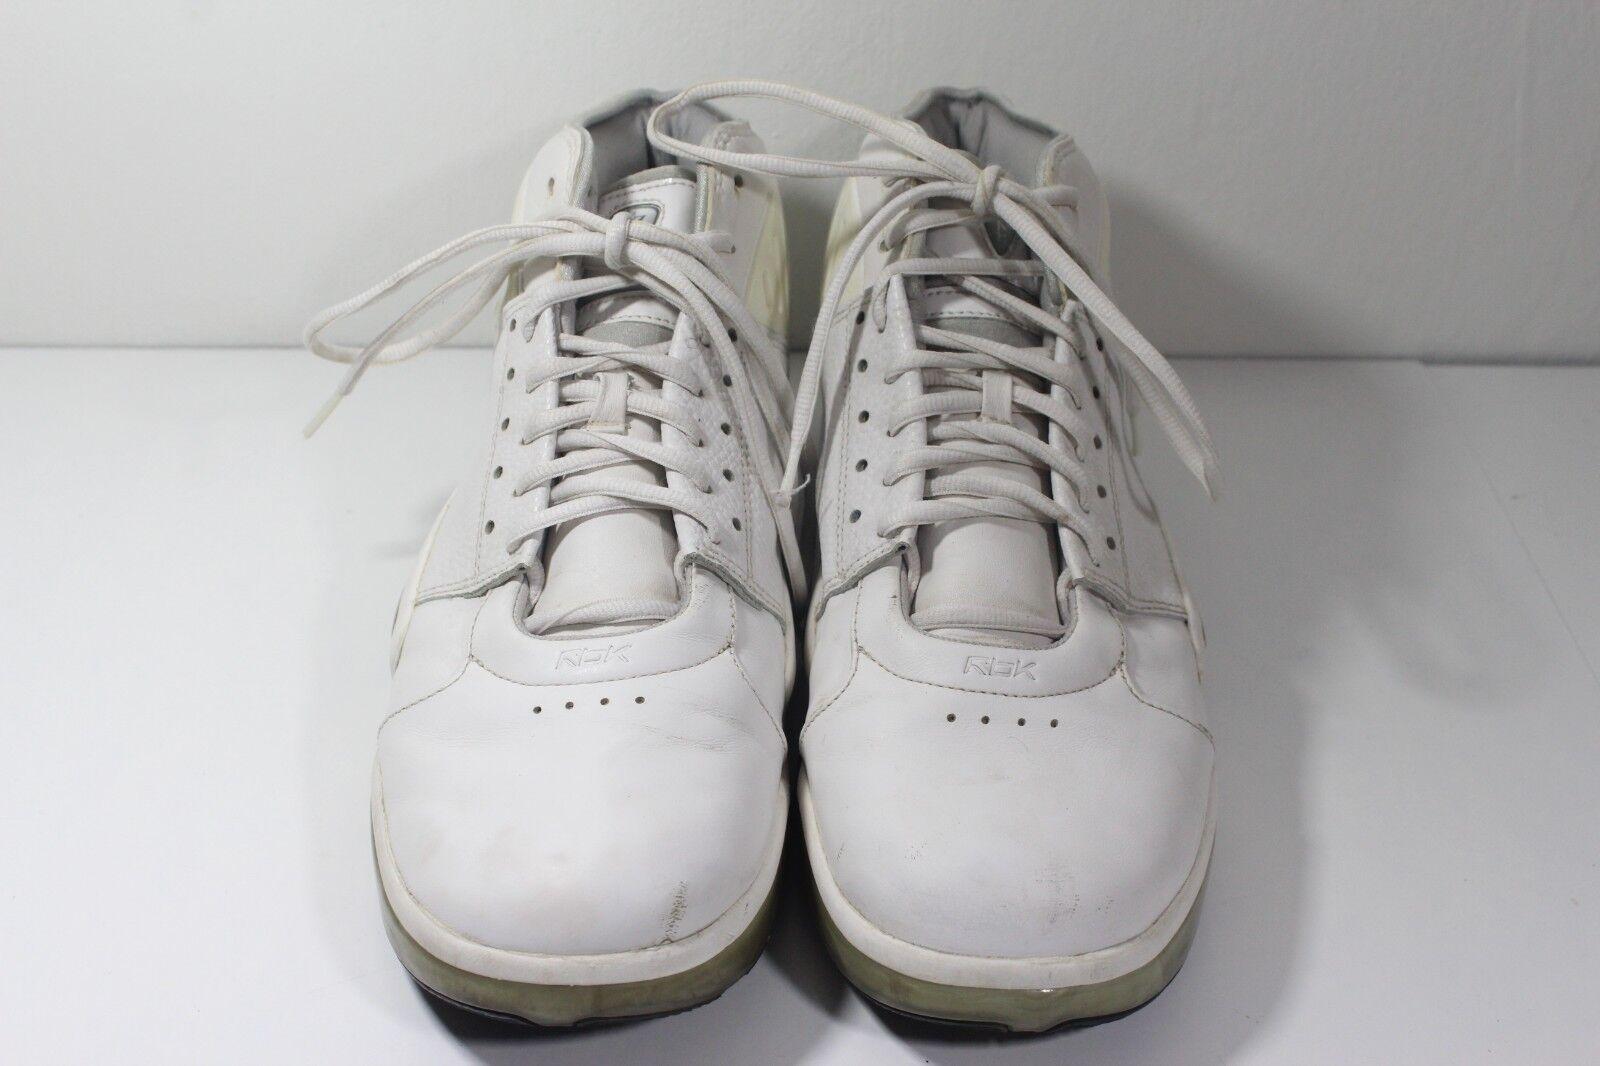 super popular ce0df 48504 Reebok ATR Above The Rim Men s Basketball shoes - Size 12